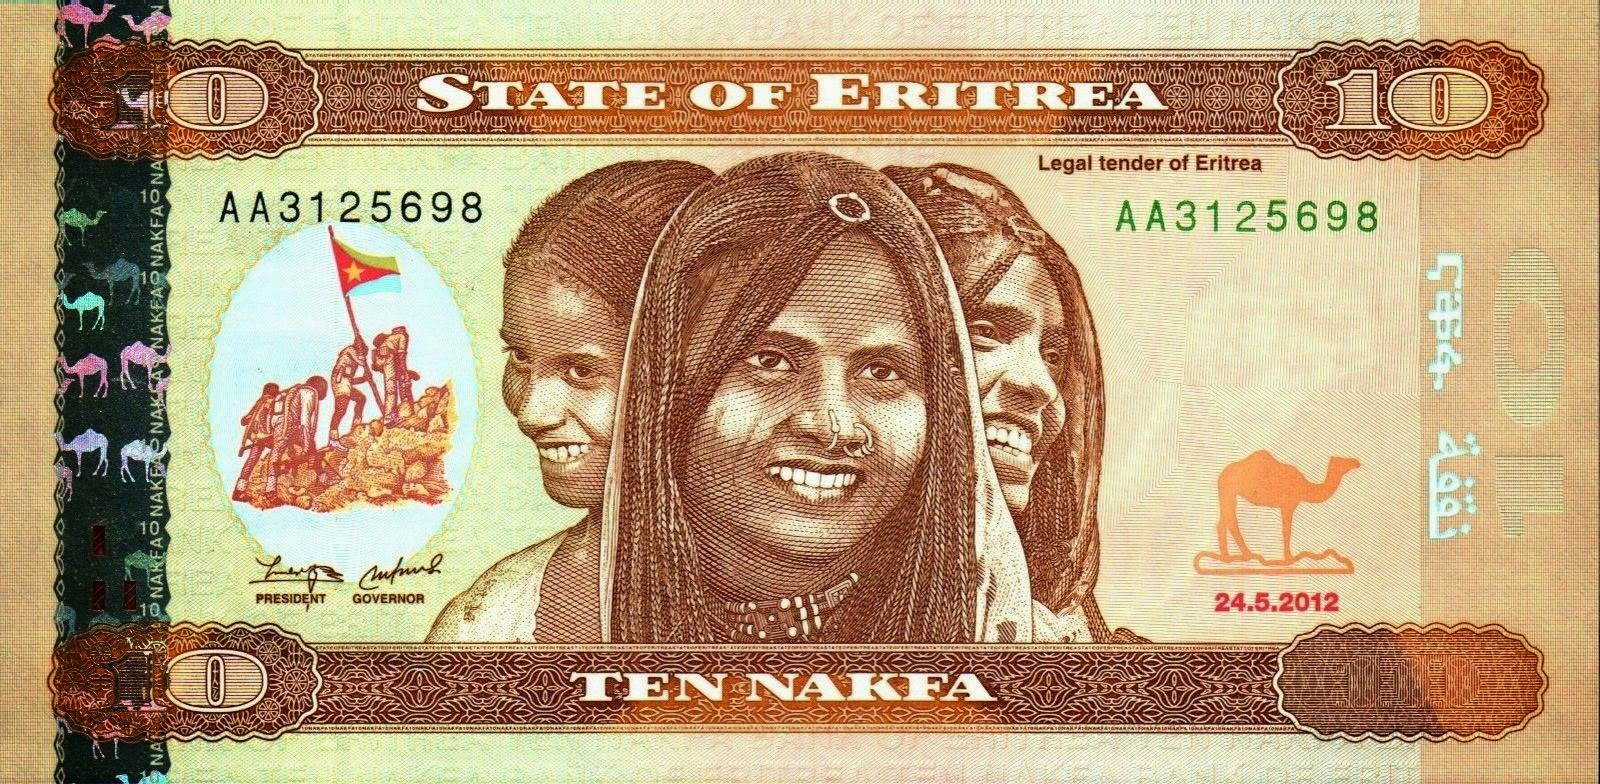 Eritrea banknotes 10 Eritrean nakfa note